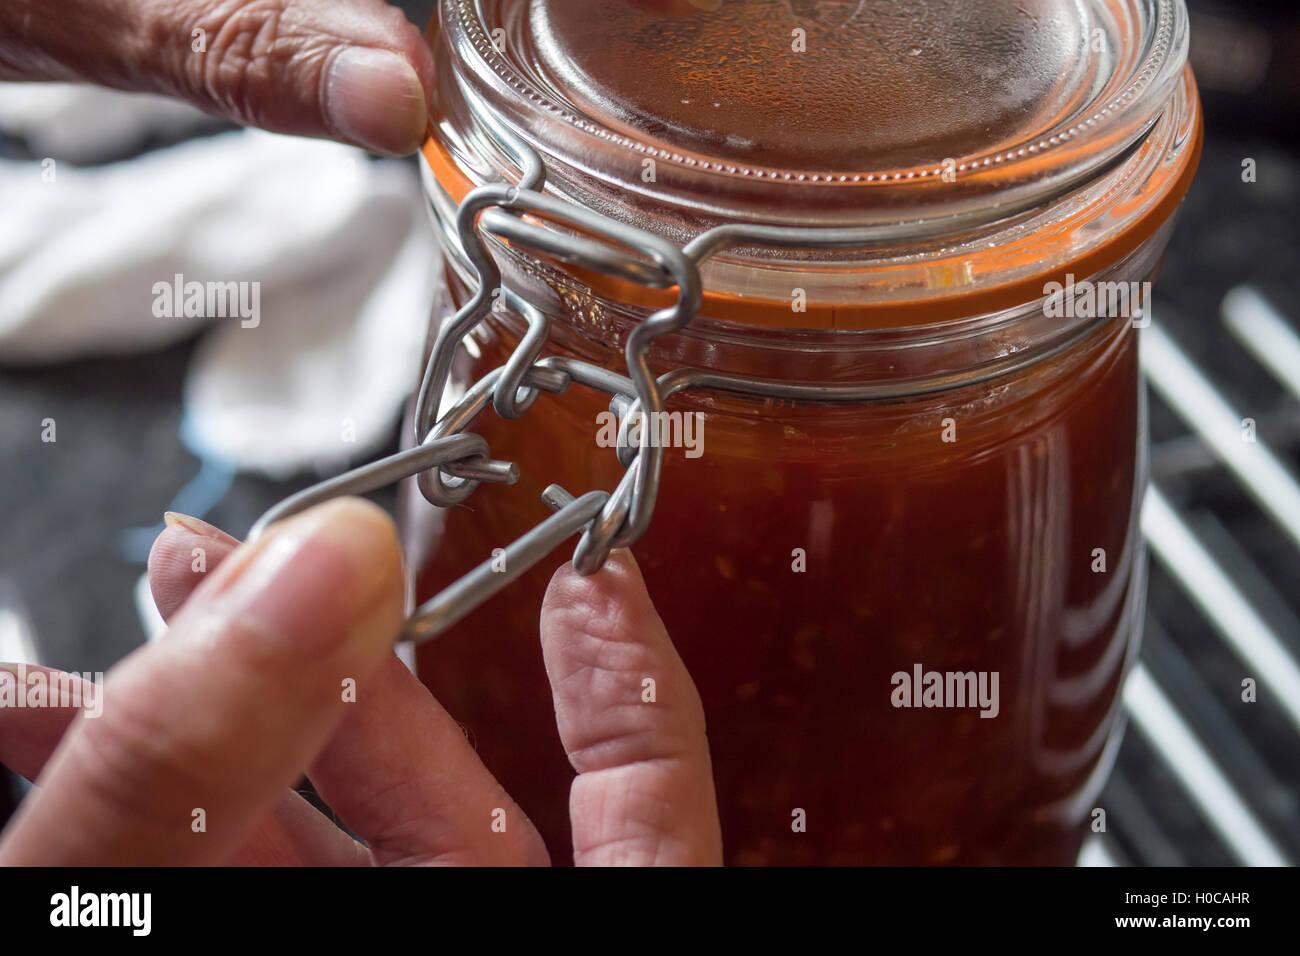 Making Tomato Chutney at home - Stock Image